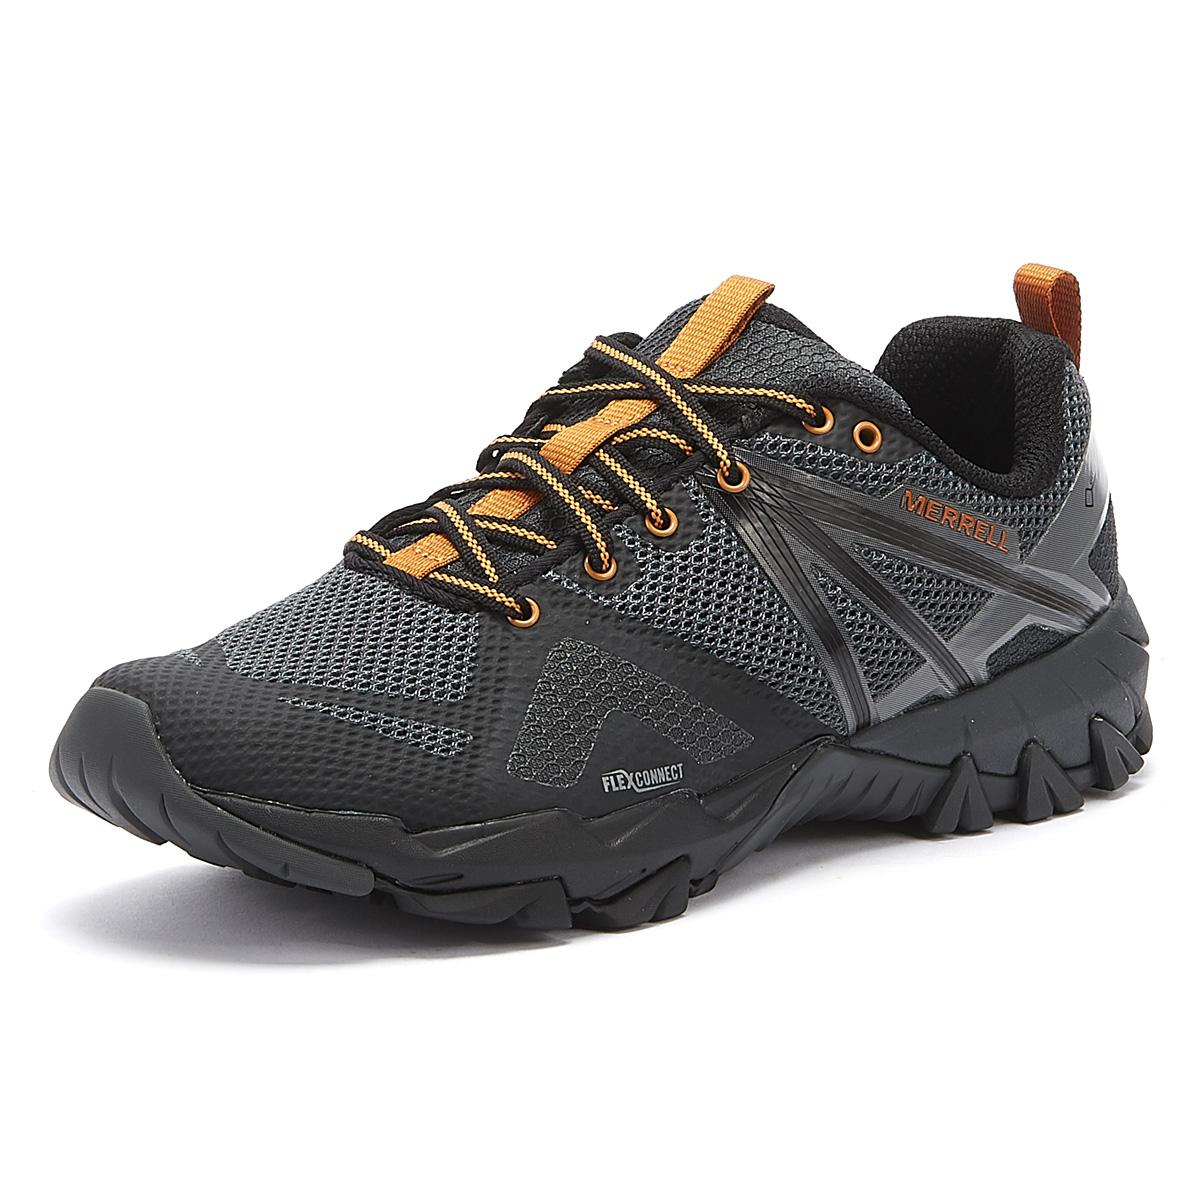 Merrell Mens MQM Flex GORE-TEX Walking Shoes Blue Green Yellow Sports Outdoors